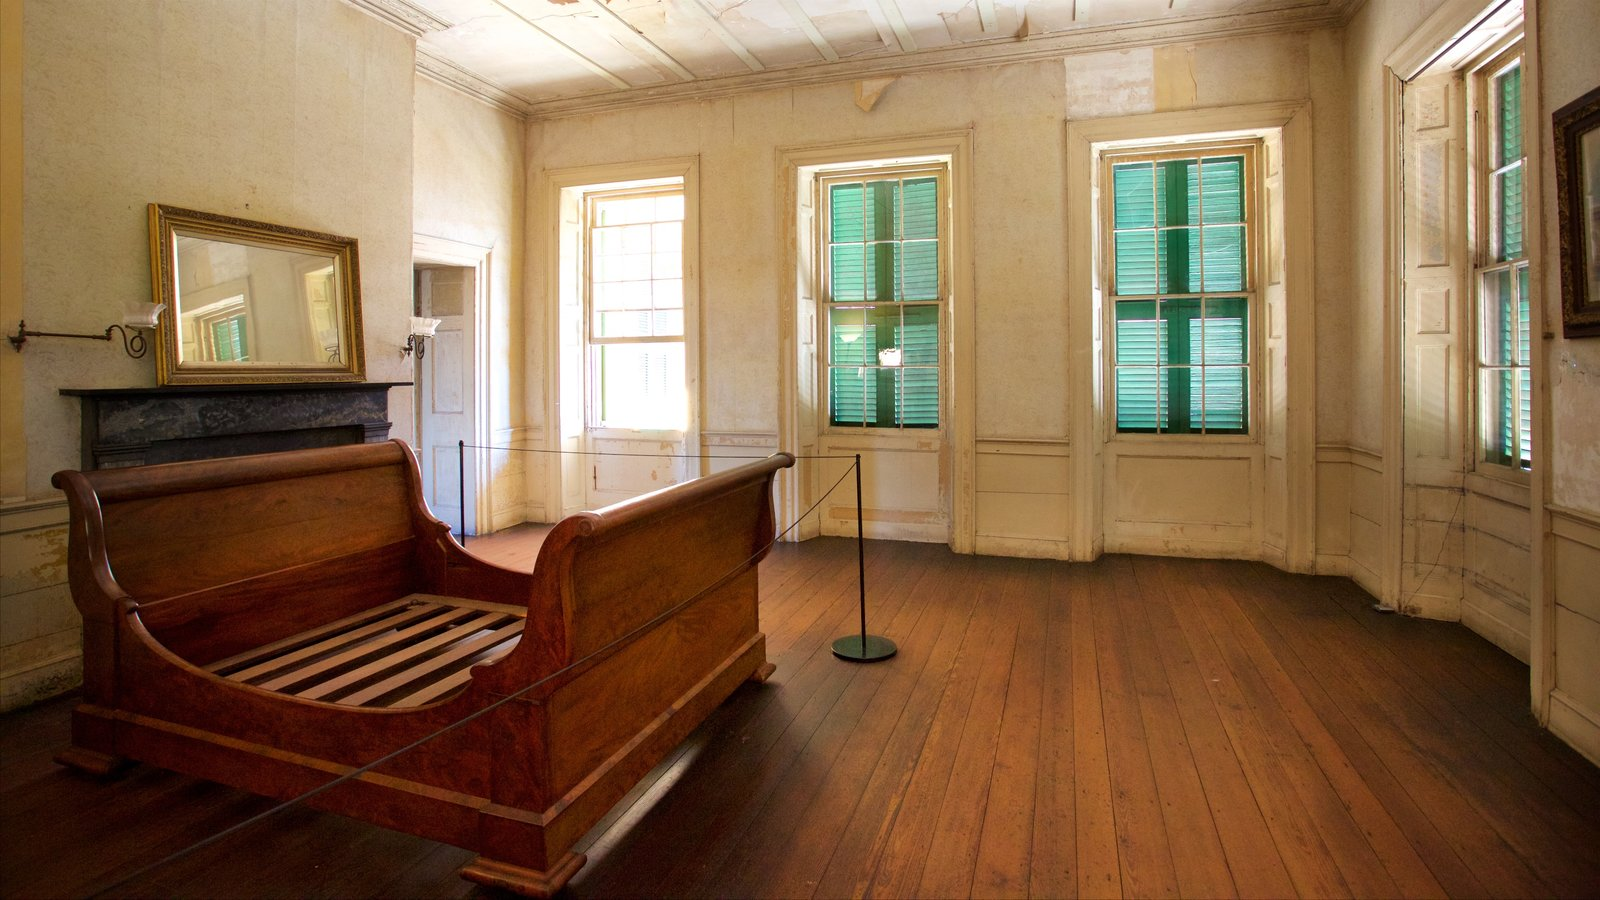 Aiken-Rhett House que inclui vistas internas e elementos de patrimônio